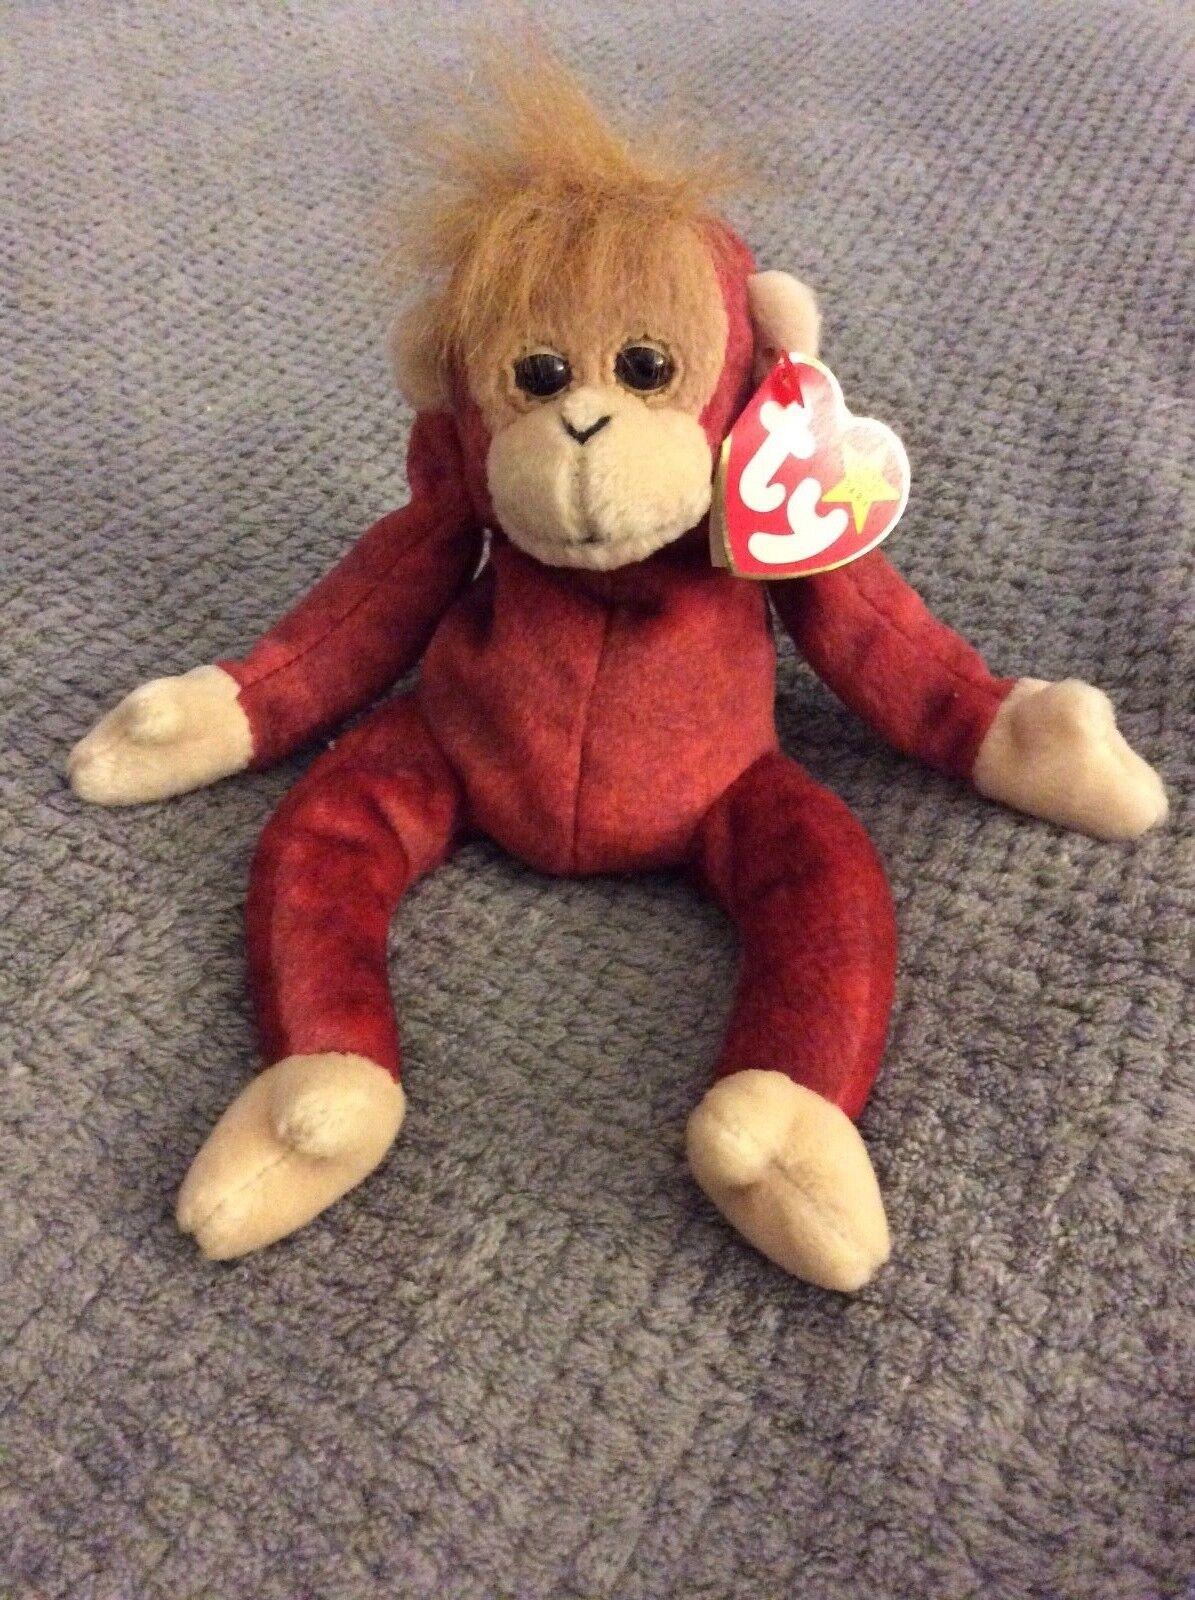 Ty Beanie Baby Schweetheart 1999 DOB January 23 a1c4bdc70a